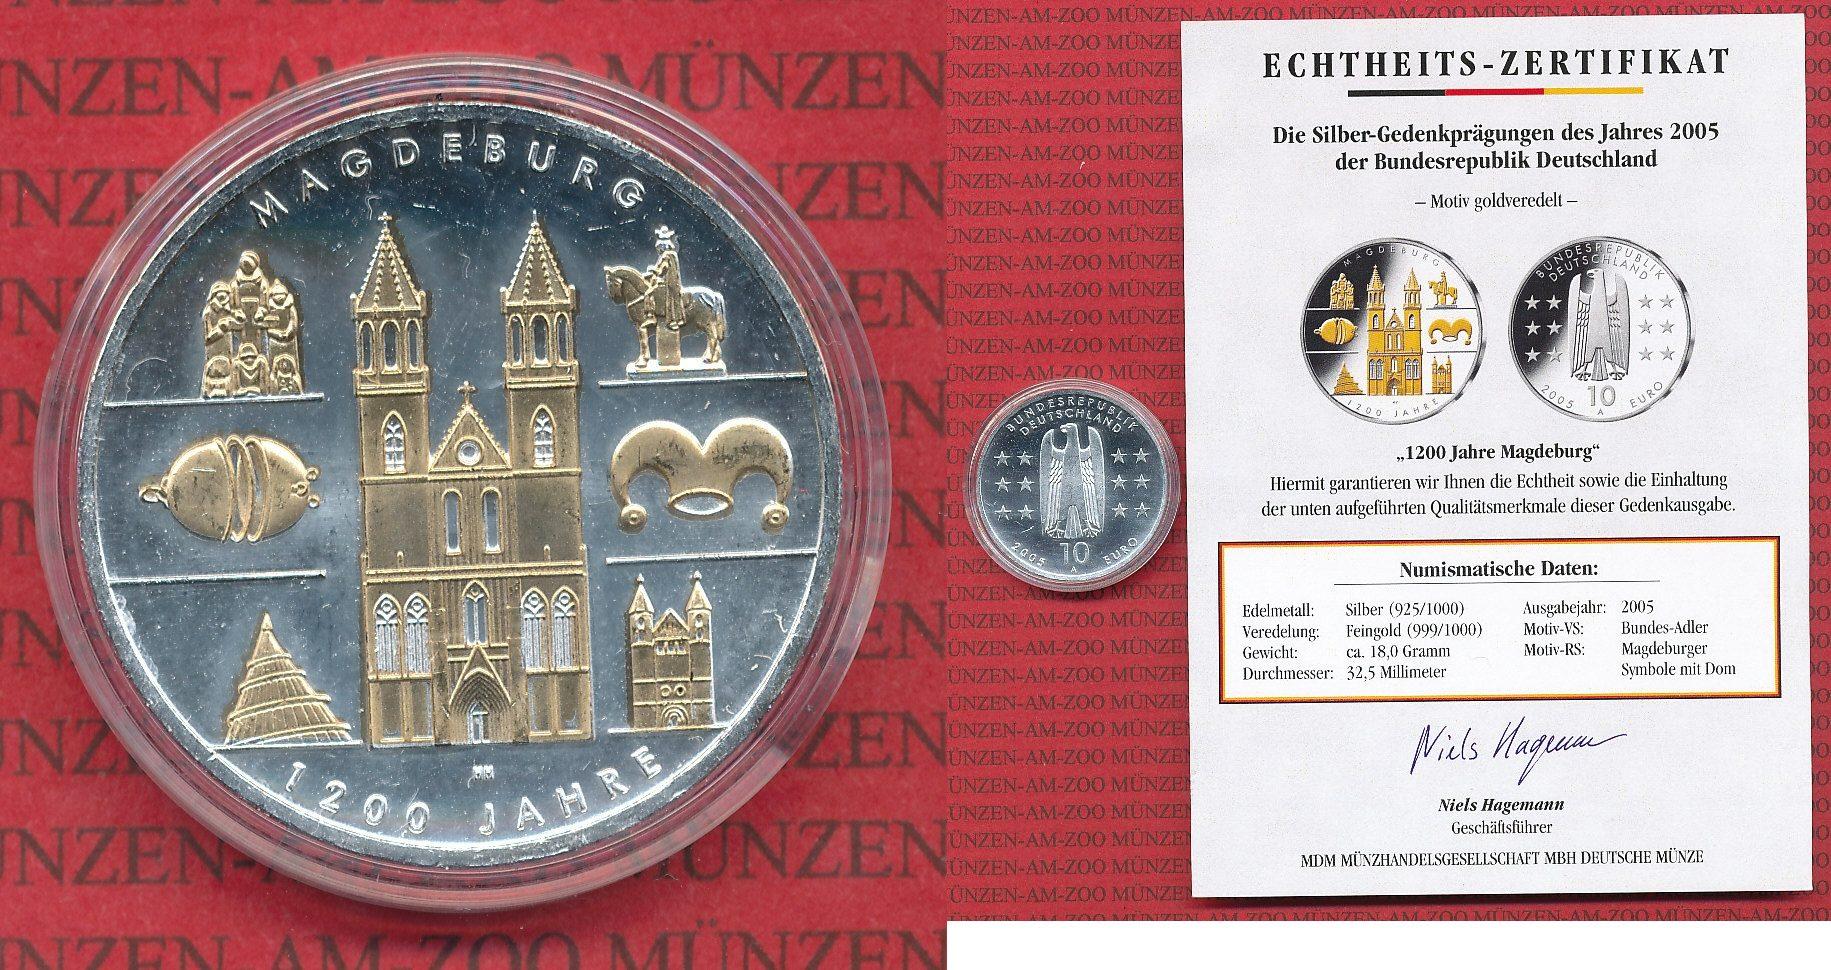 10 Euro Silbermünzemotiv Goldveredelt 2005 Bundesrepublik